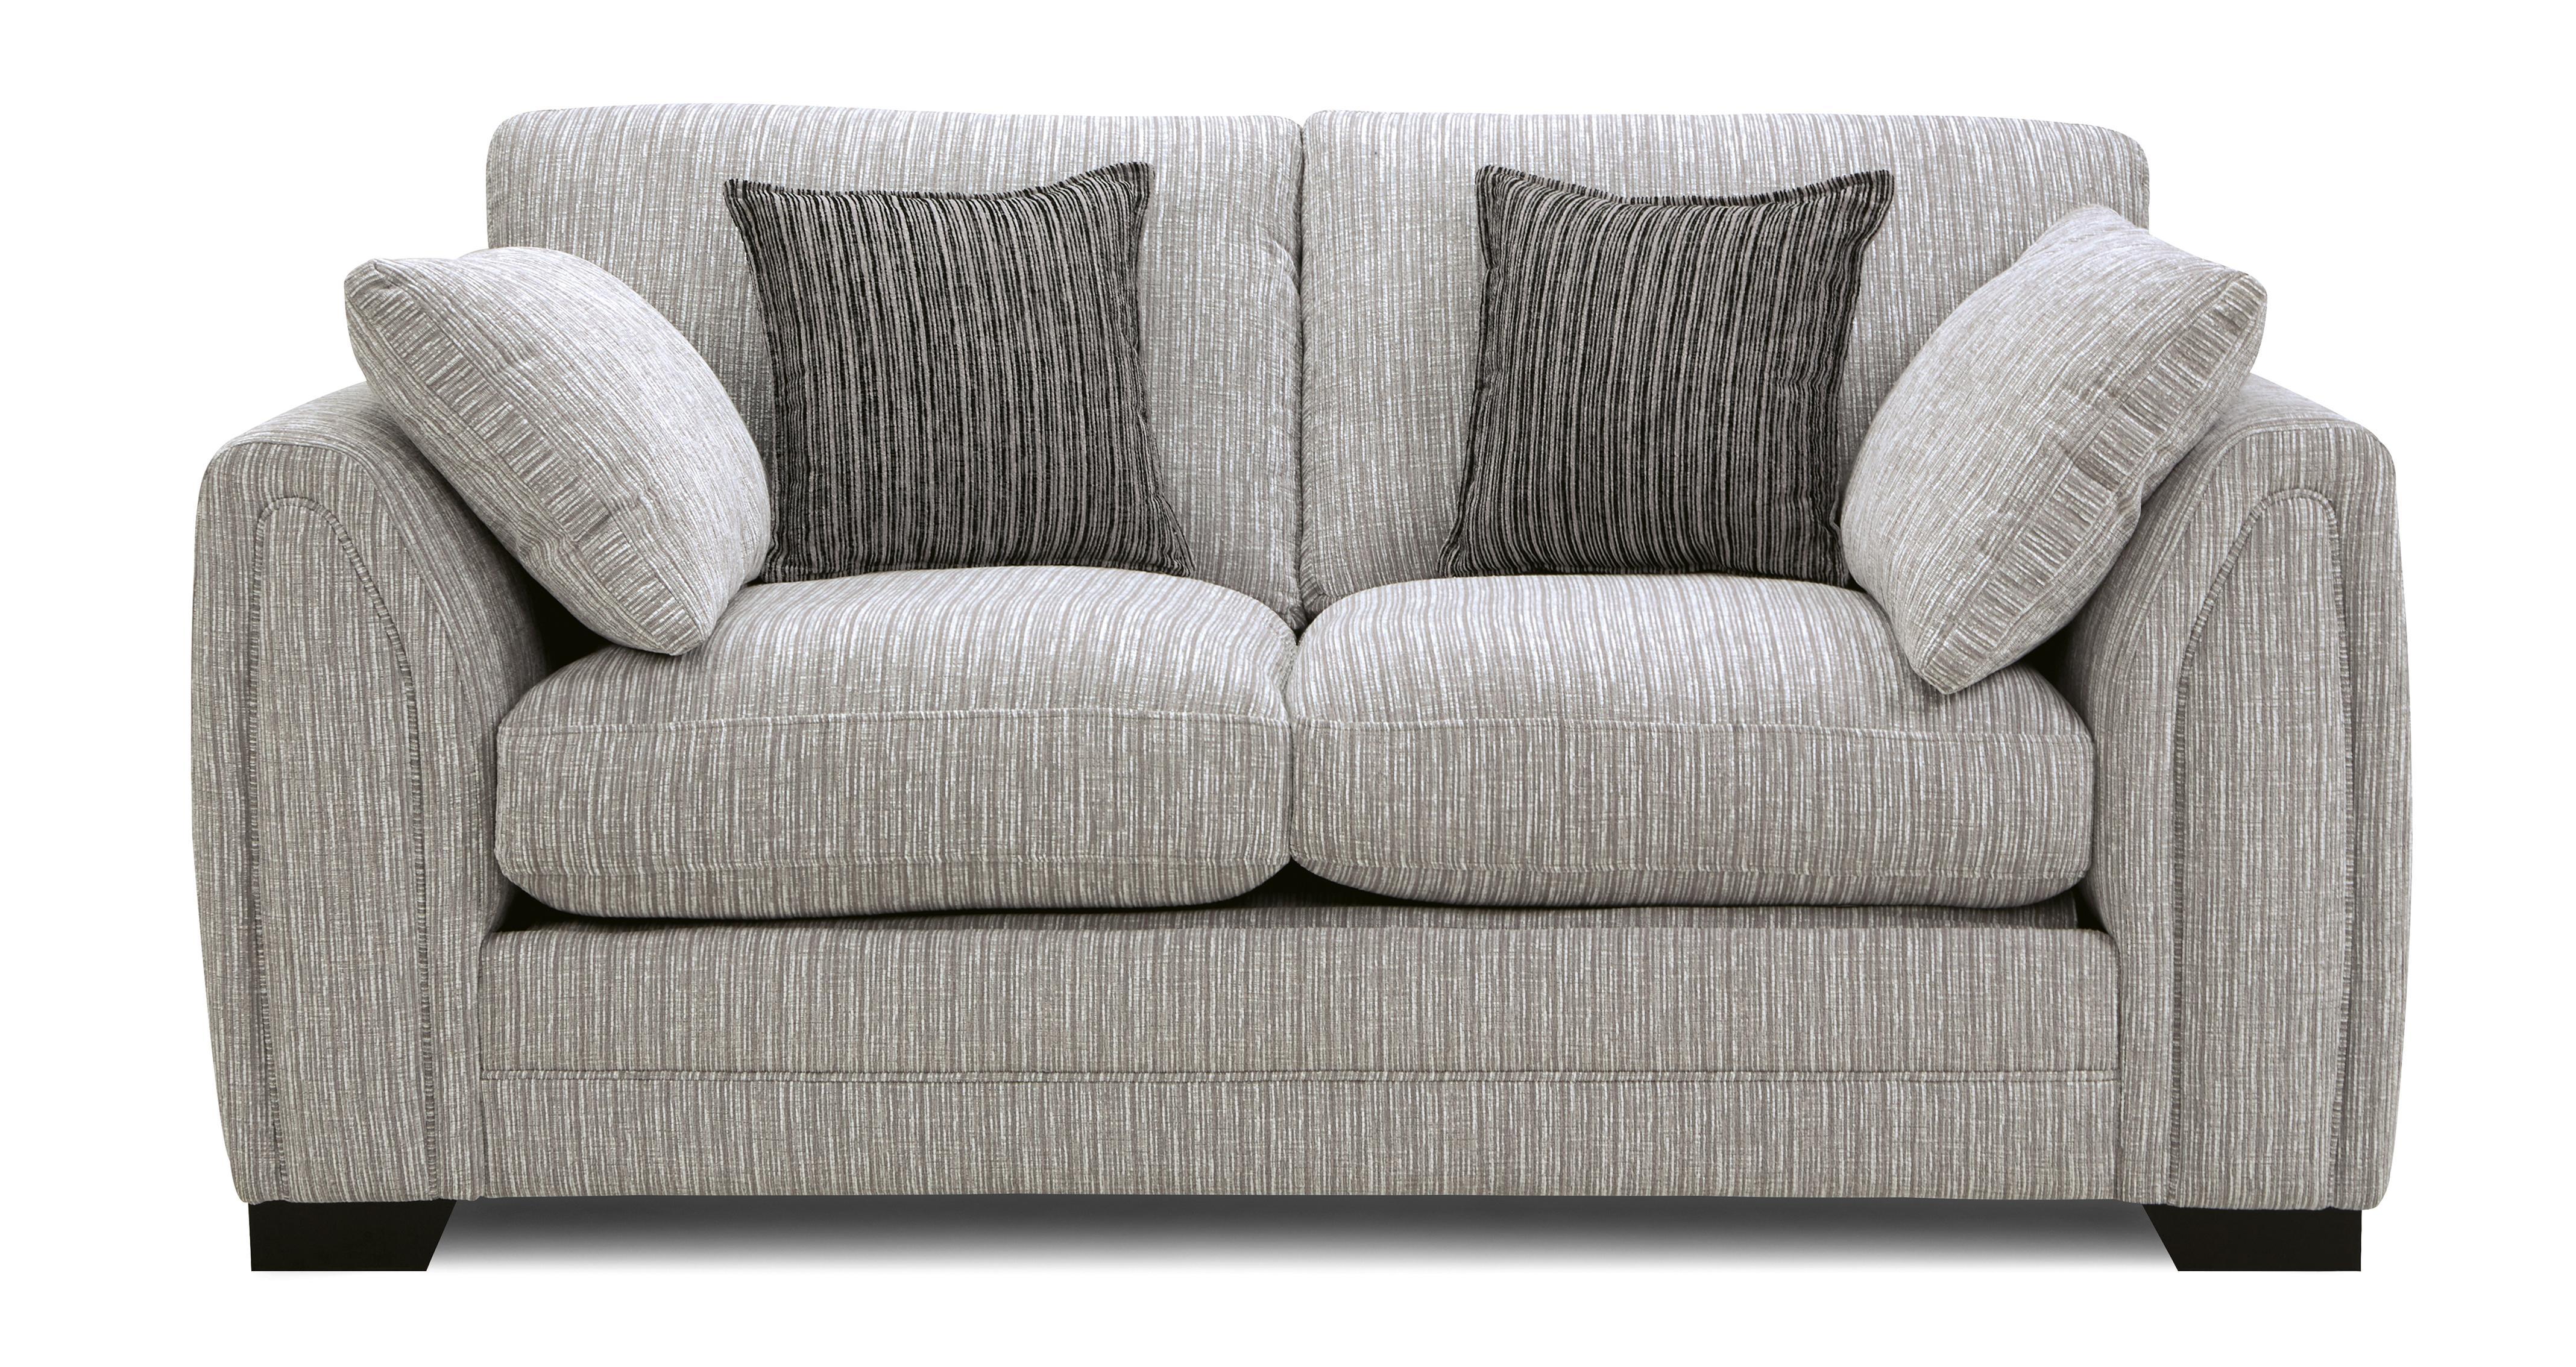 About the Harlem: Formal Back 2 Seater Supreme Sofa Bed